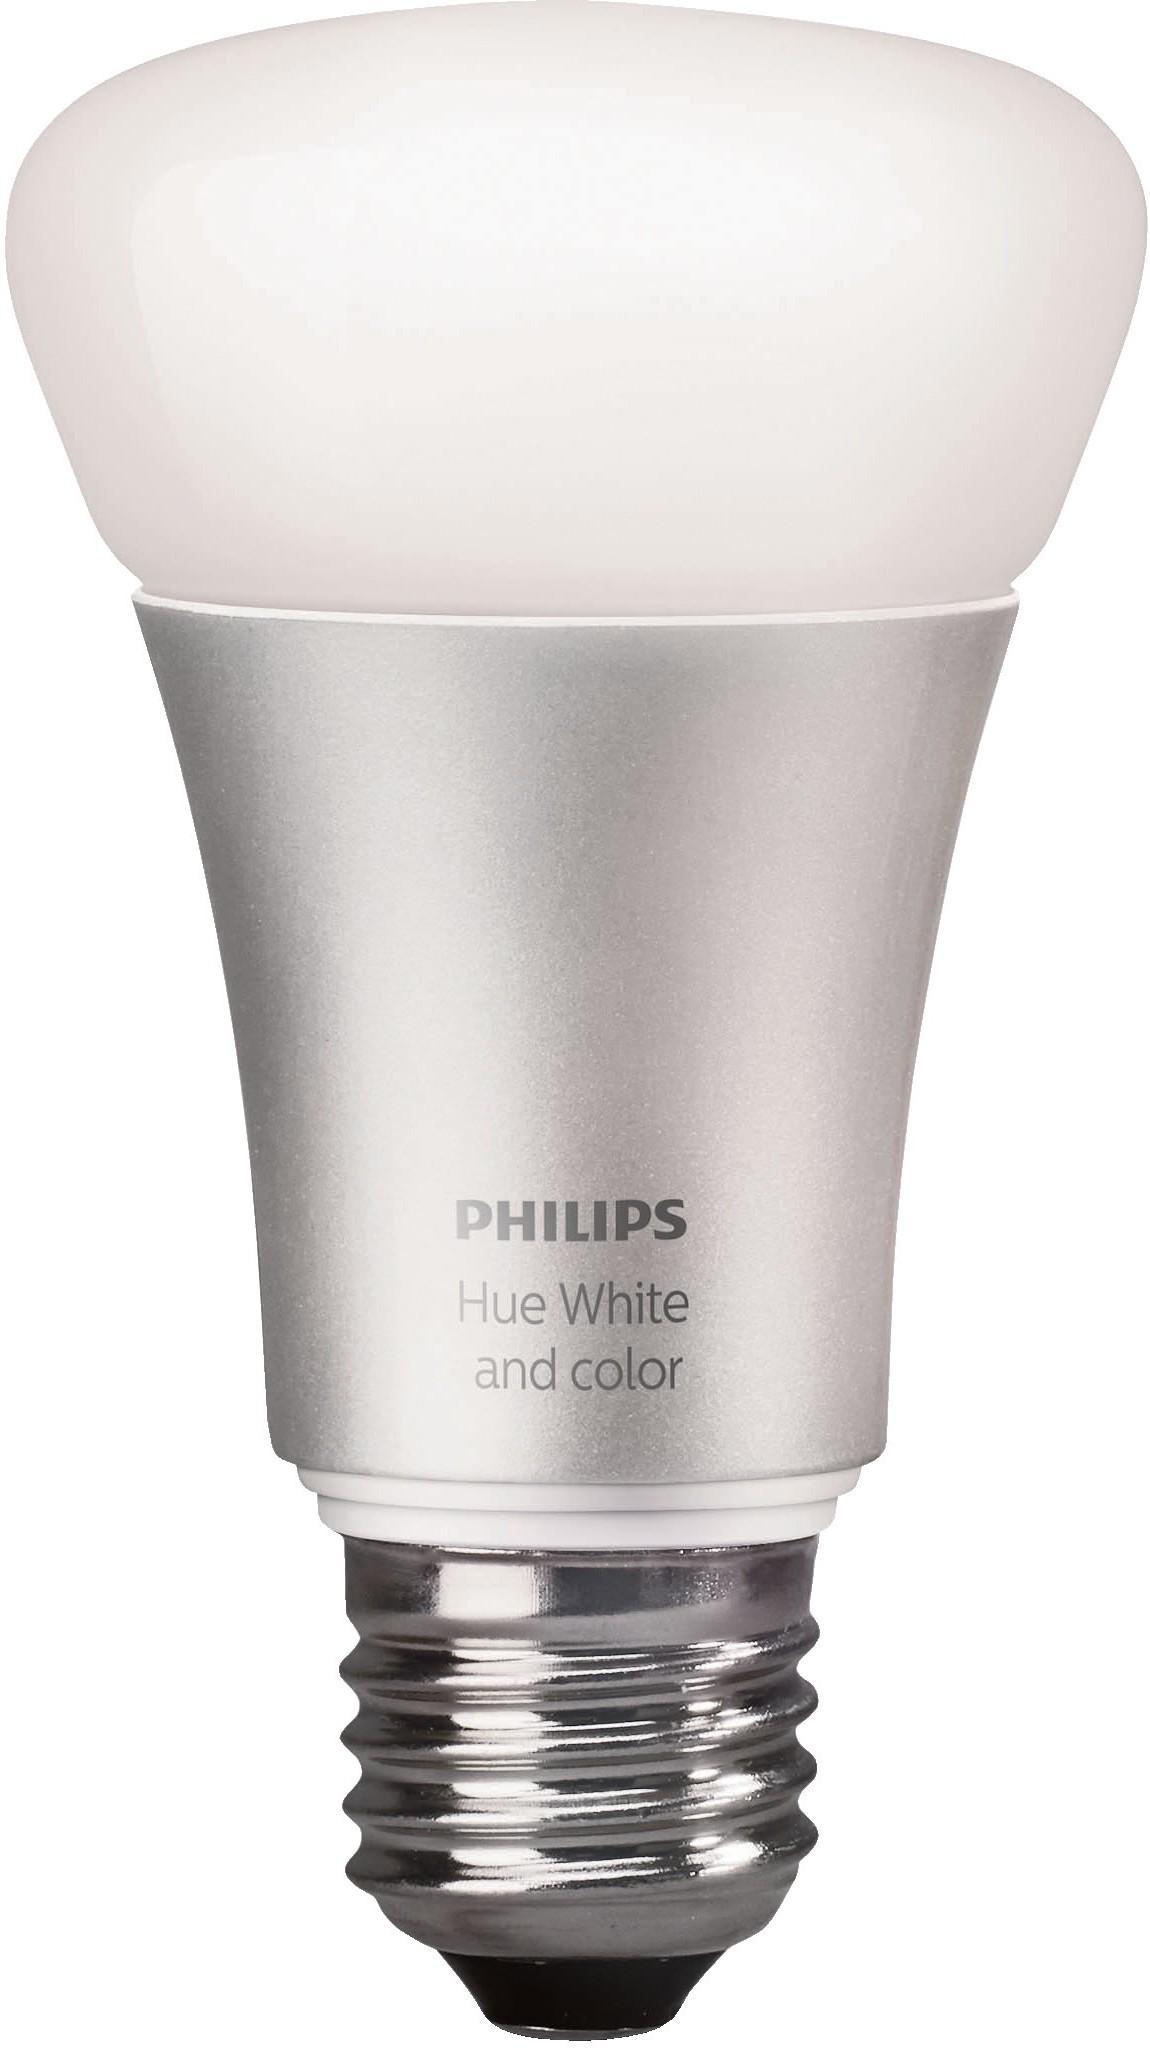 78fdb53d540 Best pris på Philips Hue White and Color Ambiance E27 Richer Colors - Se  priser før kjøp i Prisguiden